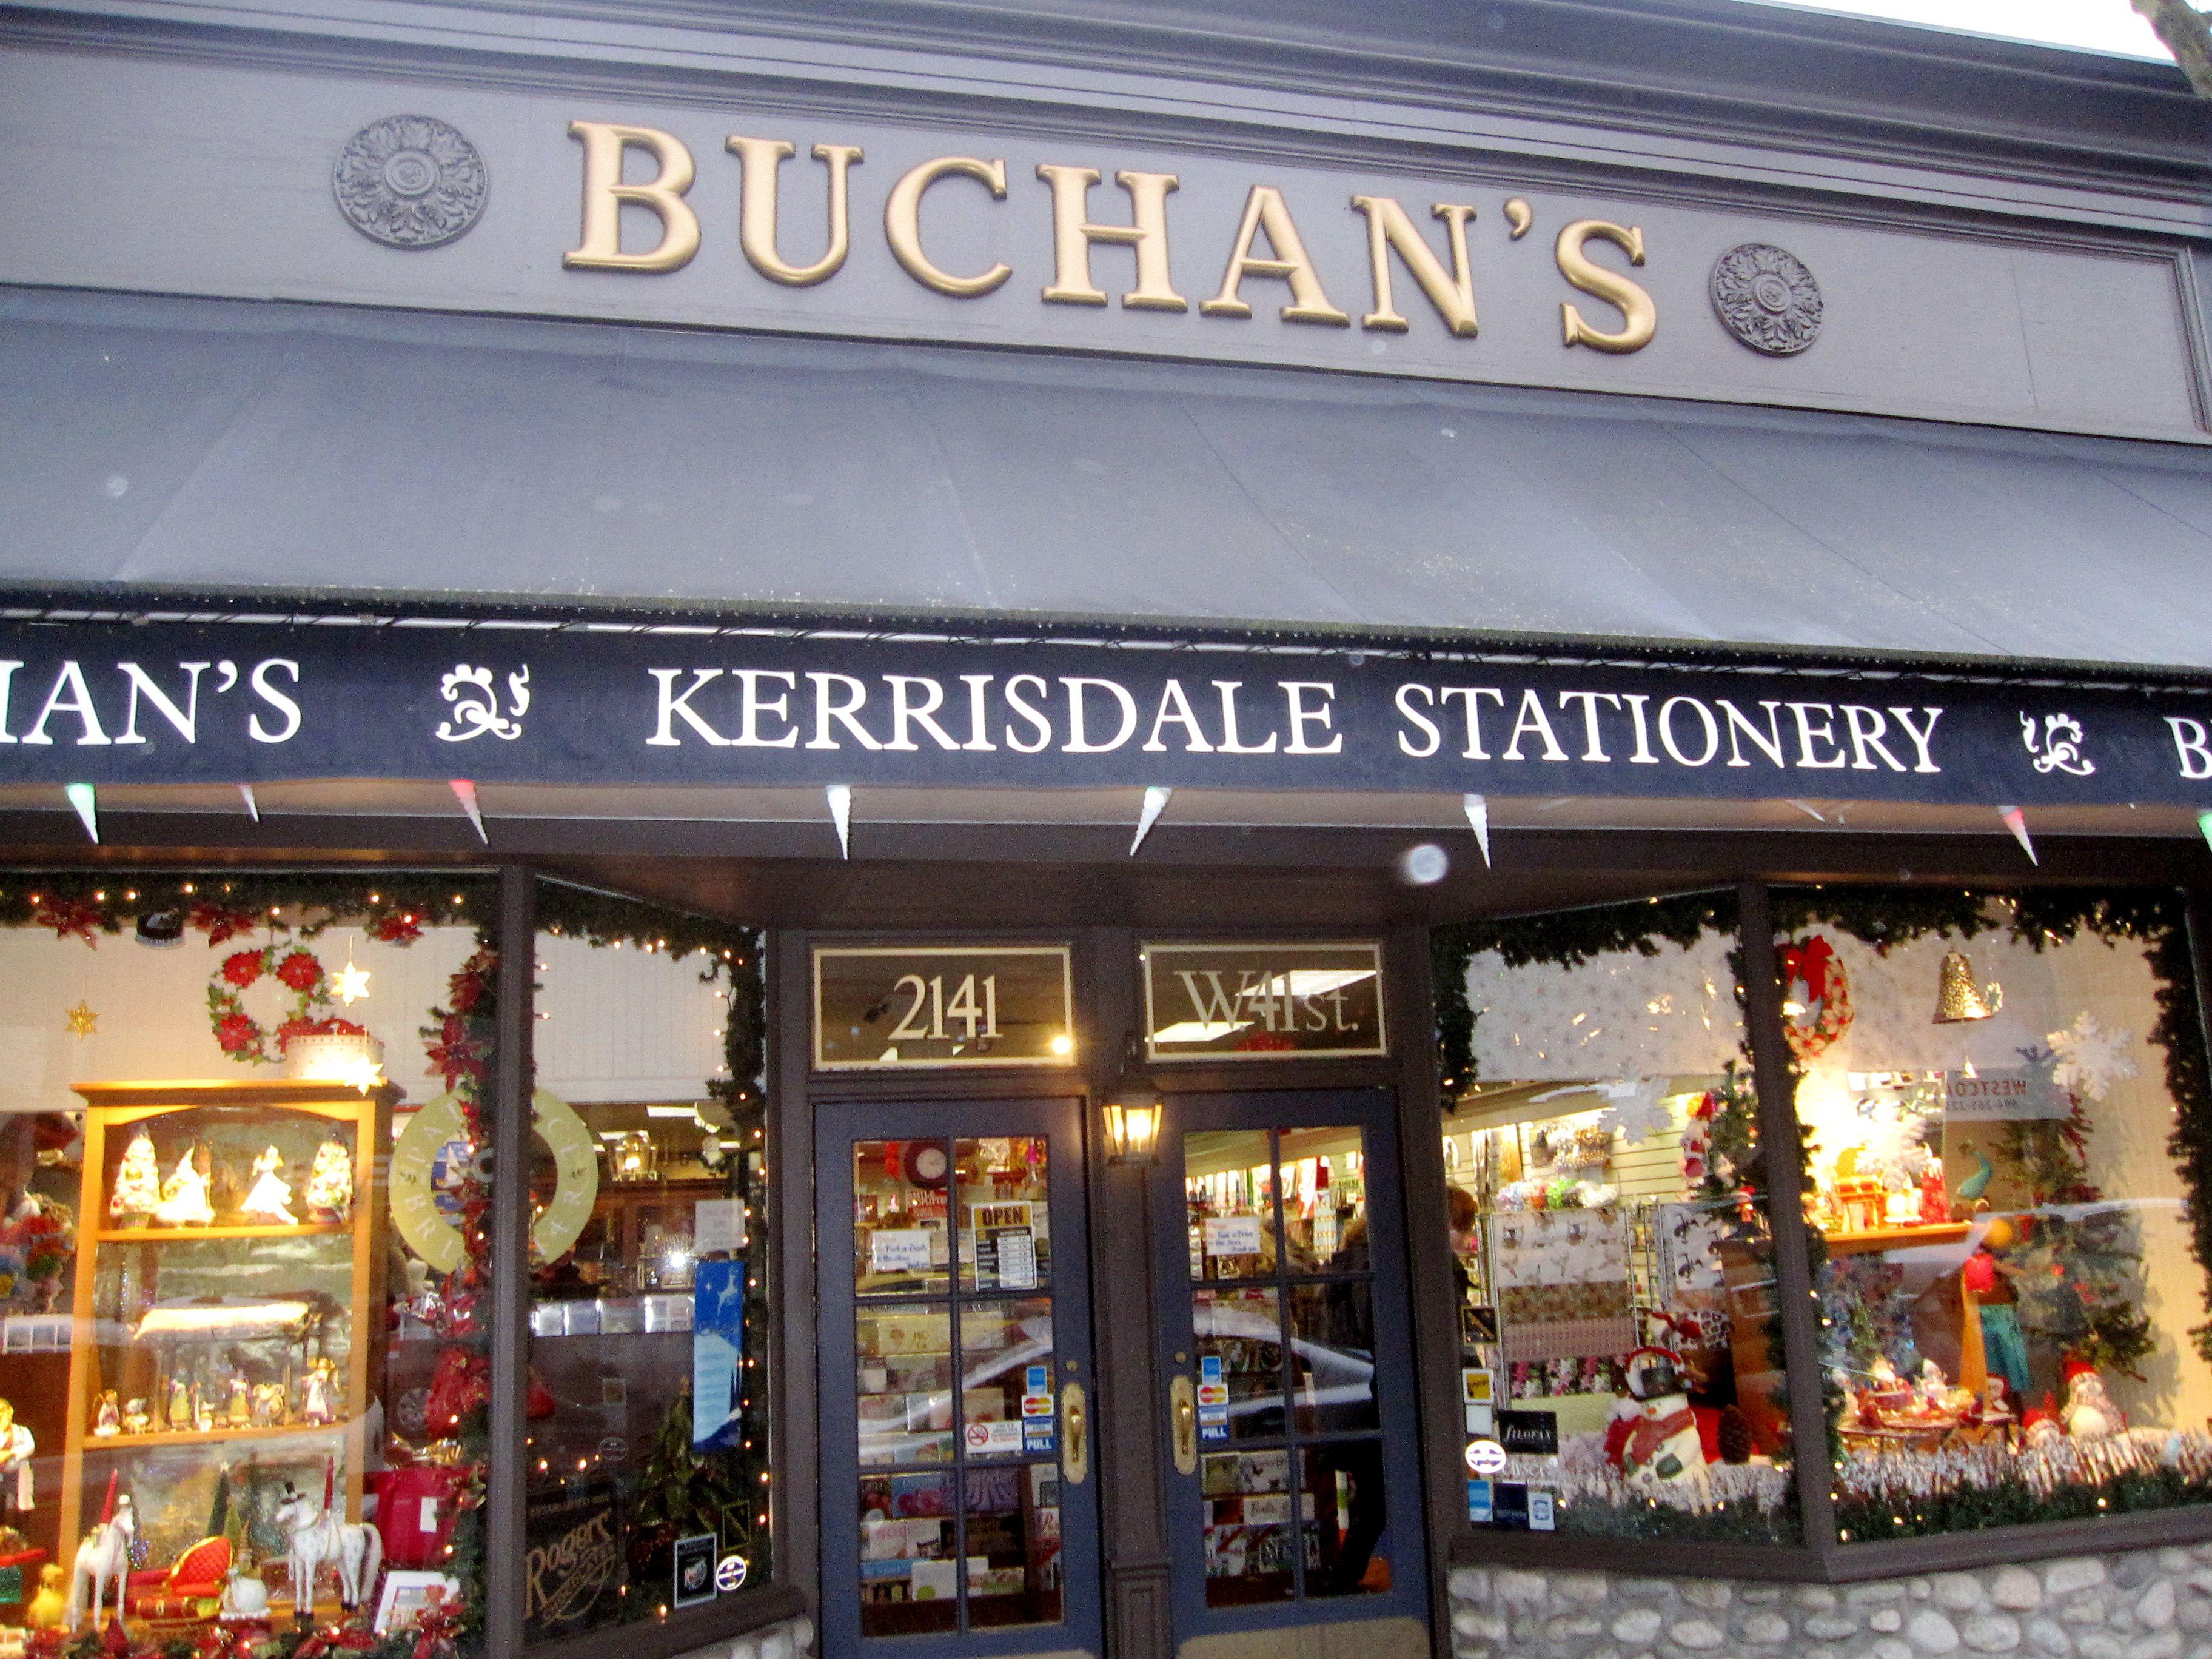 Buchan's Kerrisdale Stationary, Kerrisdale, Vancouver